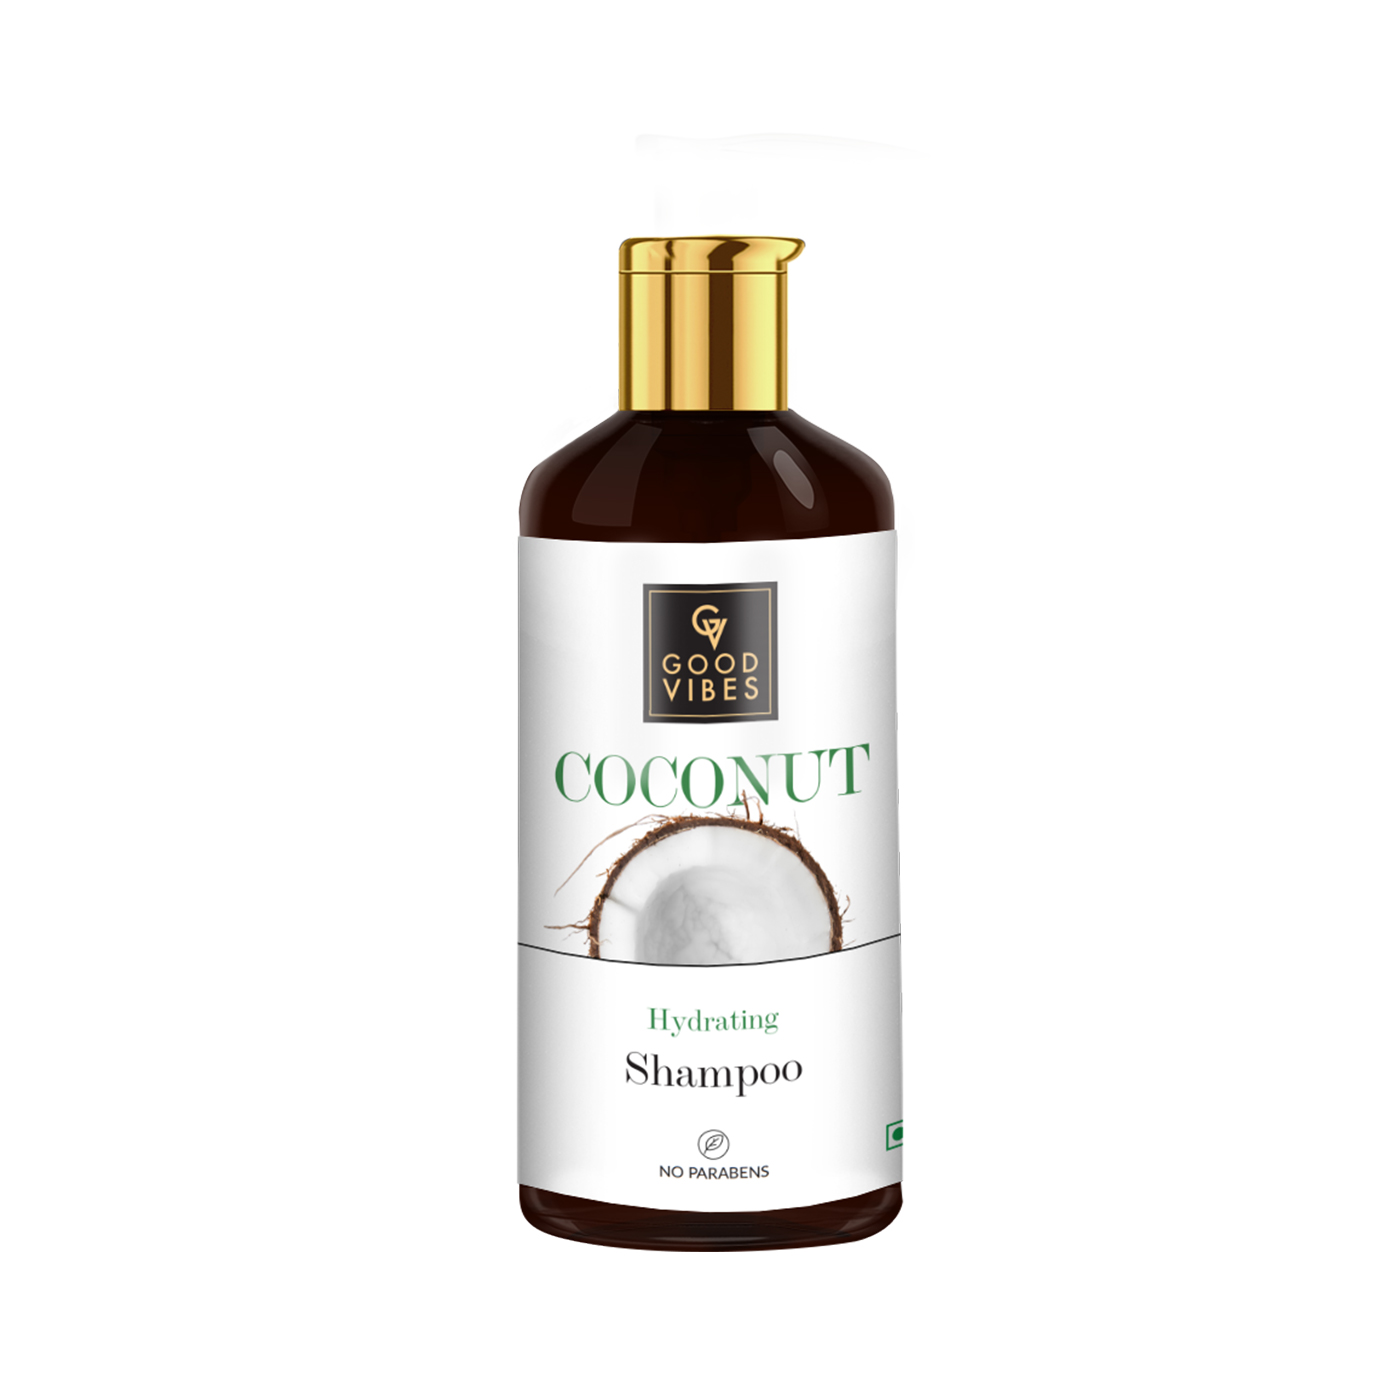 Good Vibes | Good Vibes Hydrating Shampoo - Coconut (300 ml)